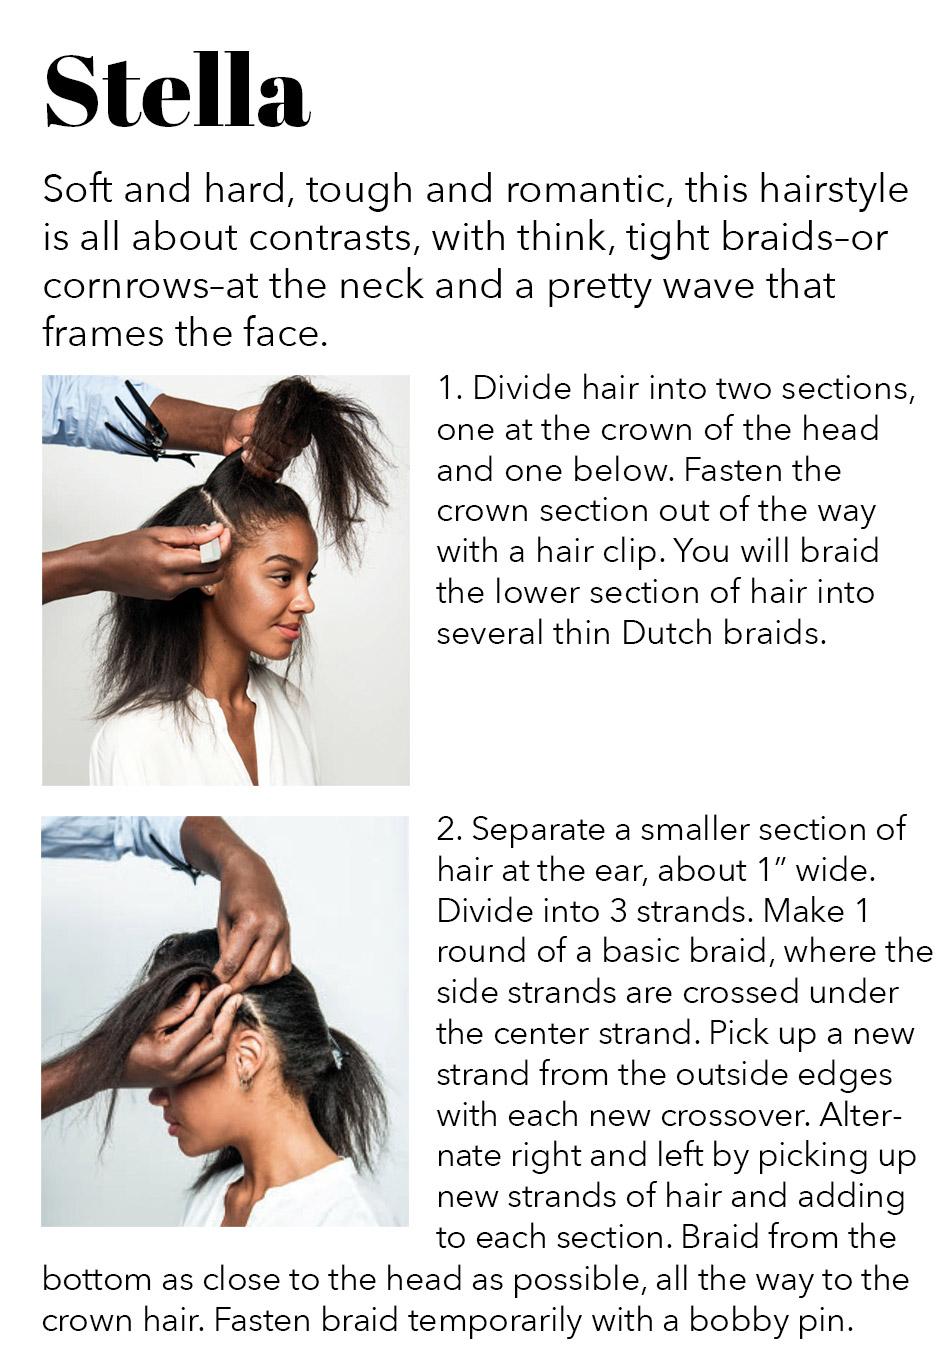 Wedding Hair Ideas Easy Braid Tutorials The Big Book of Braiding